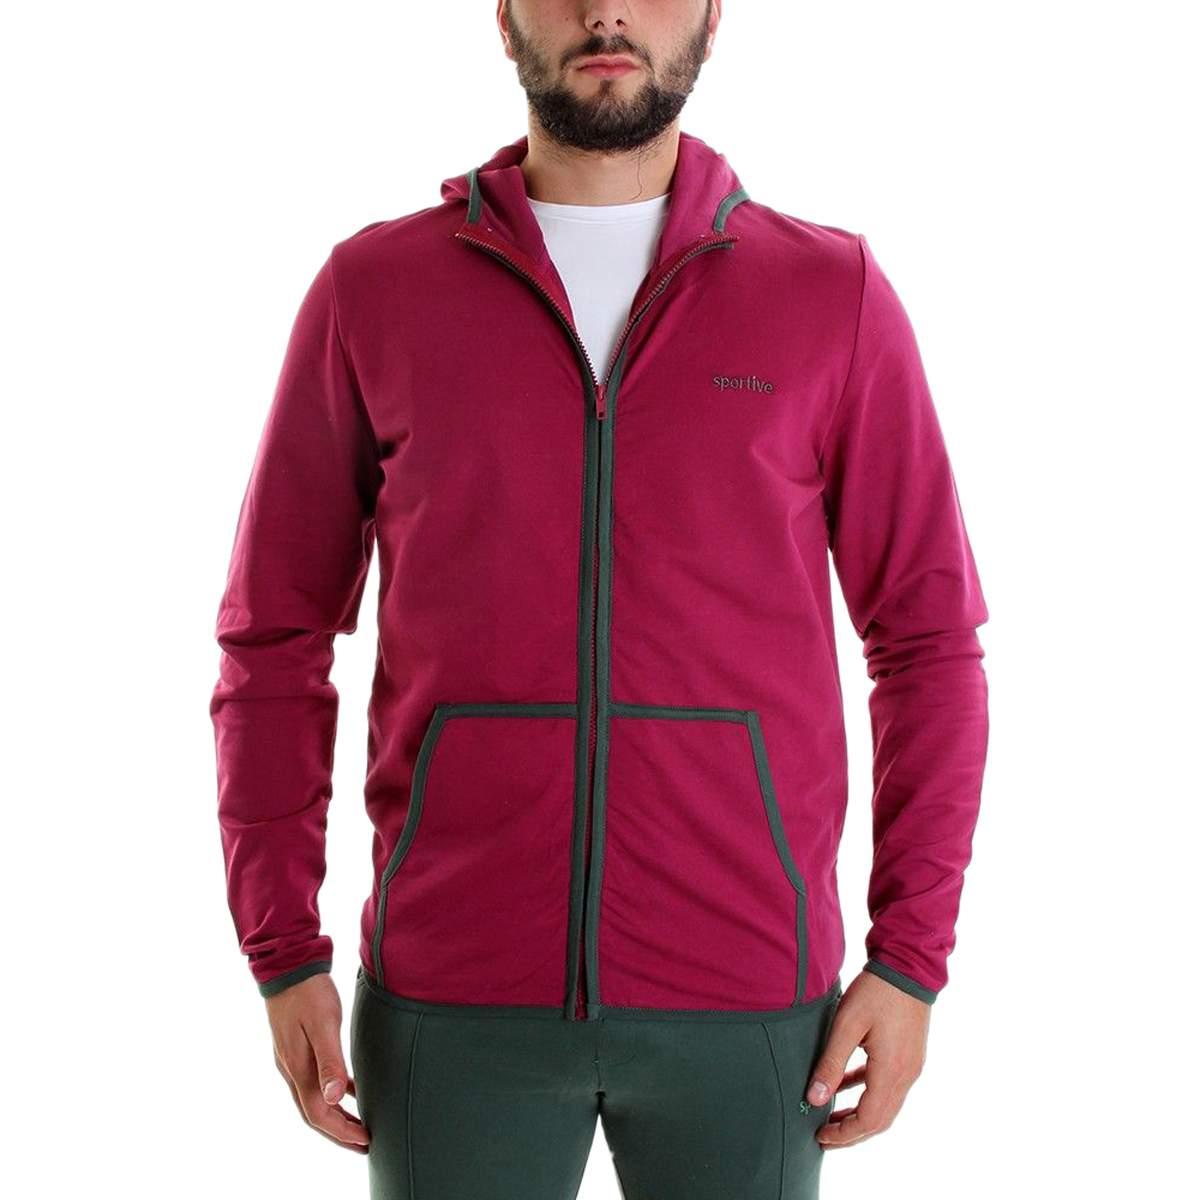 Sportive Erkek Fermuarlı Kapüşonlu Lacivert - Pembe Sweatshirt